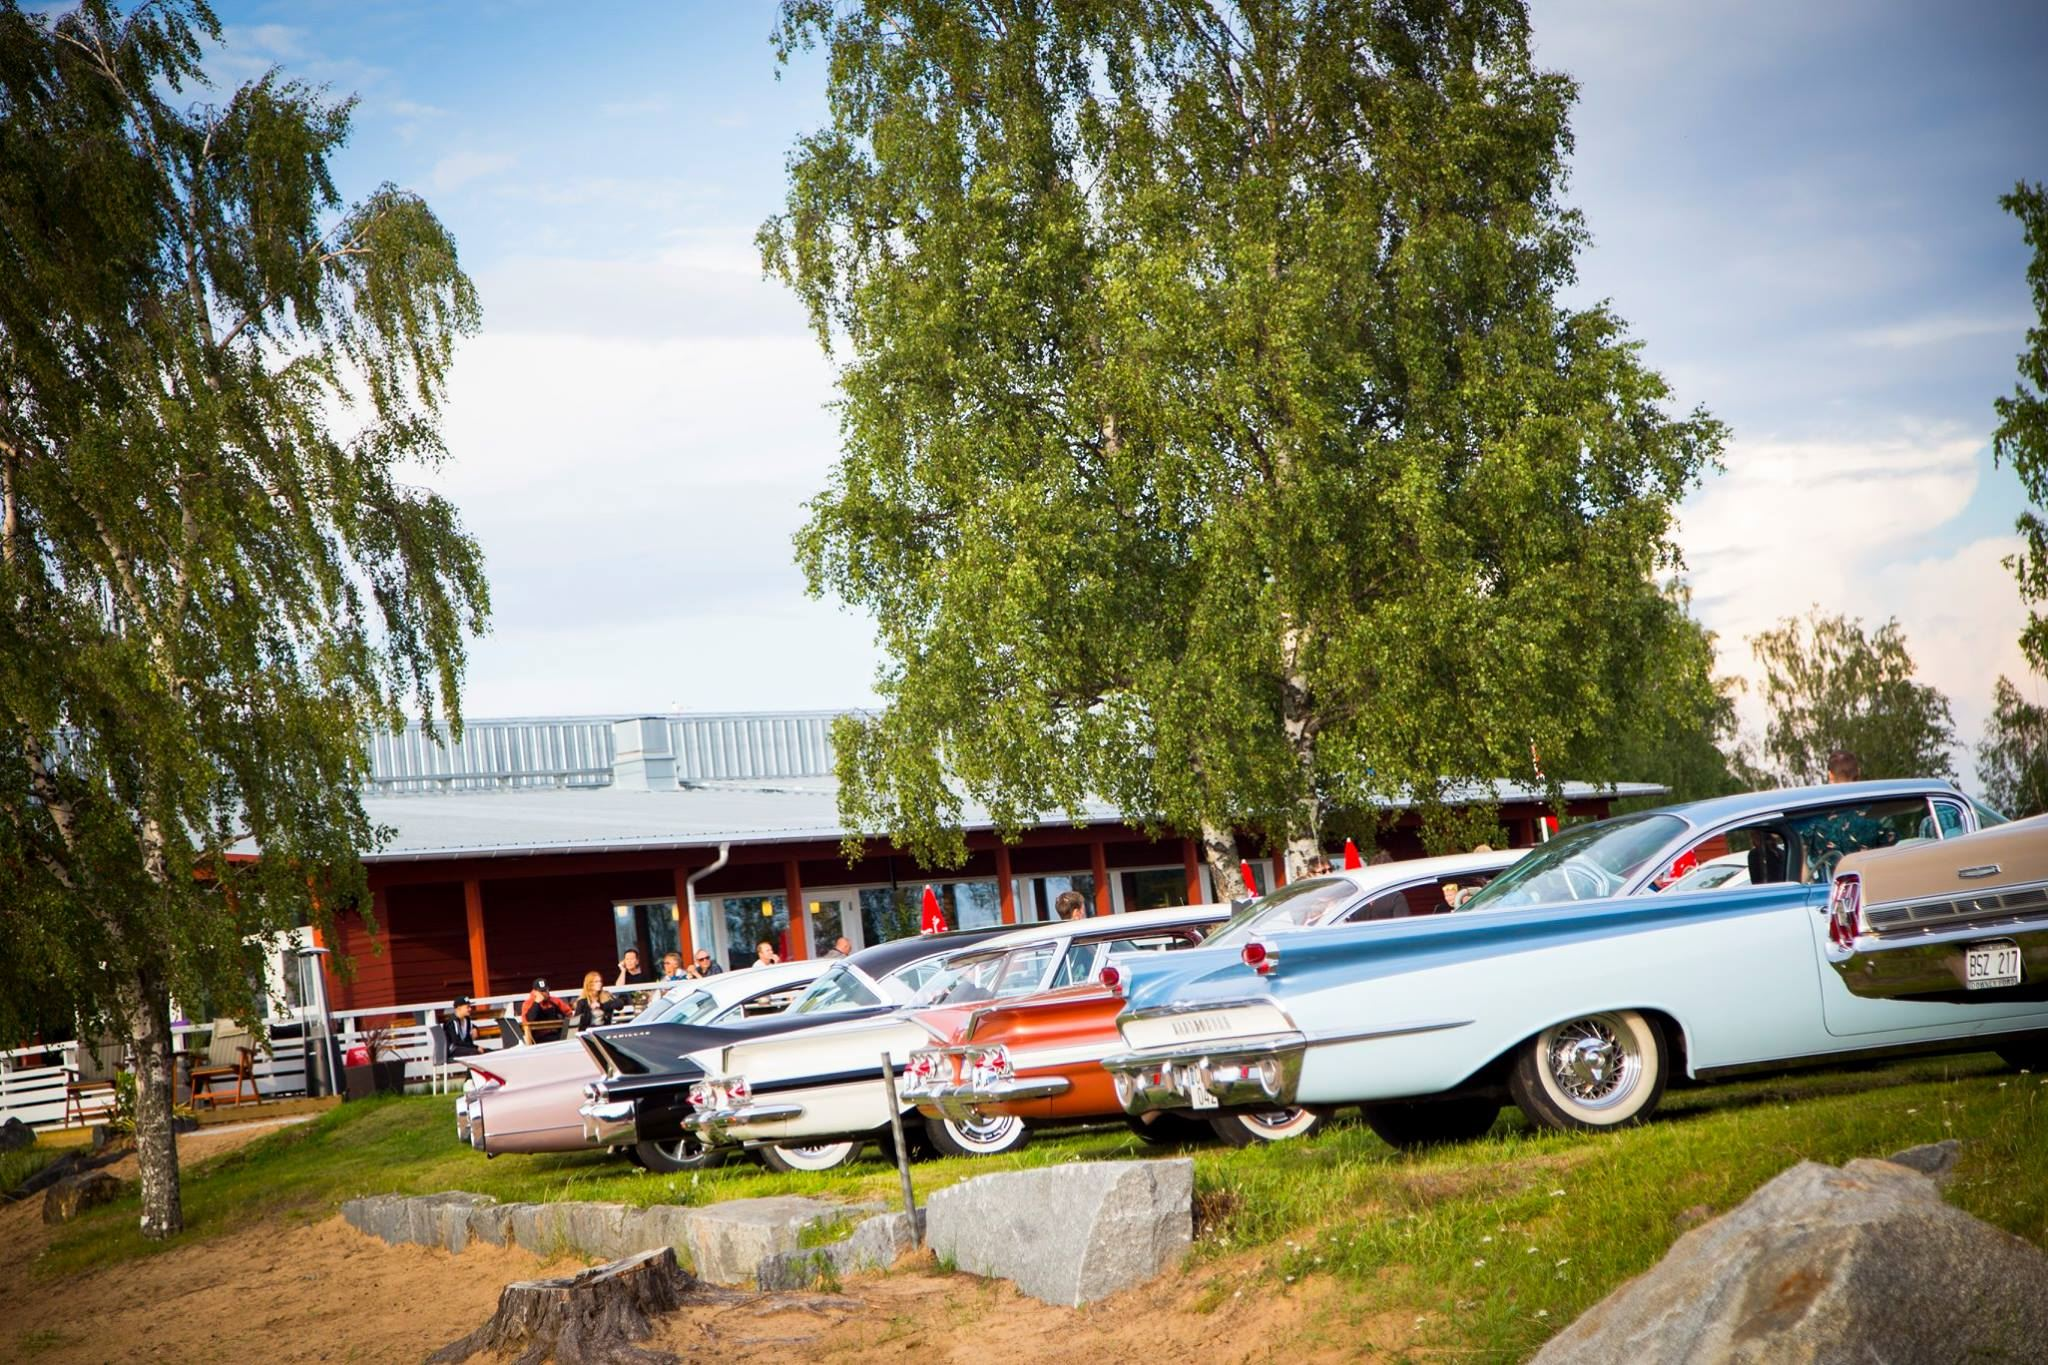 Nordic Lapland Camp & Resort Frevisören /Cottages